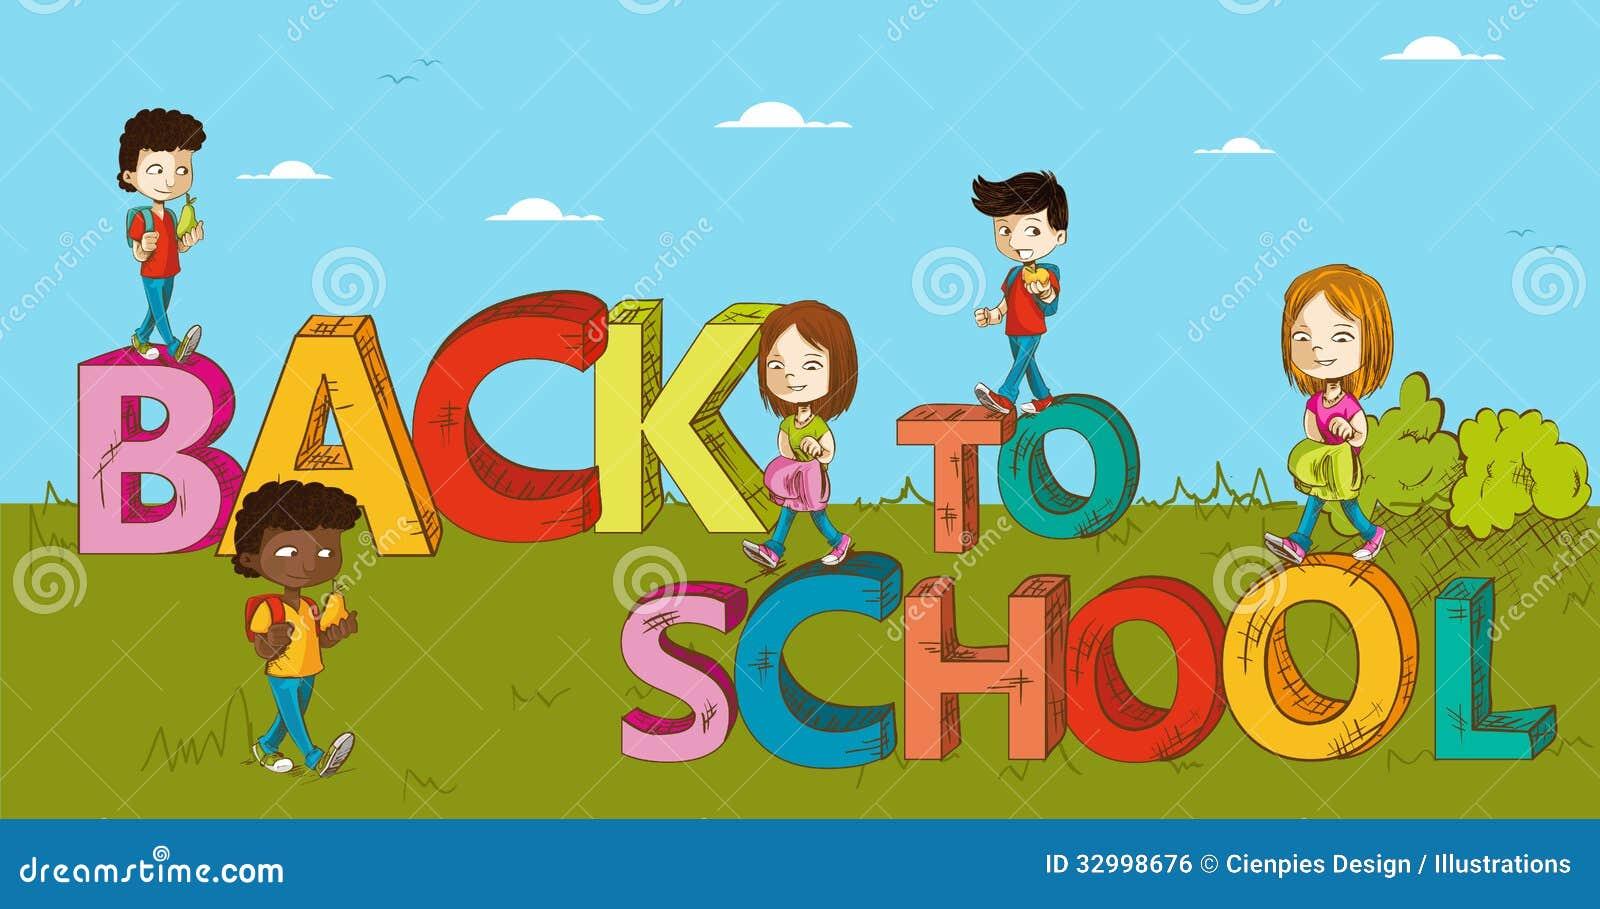 education back to school kids cartoon - Kids Cartoons Free